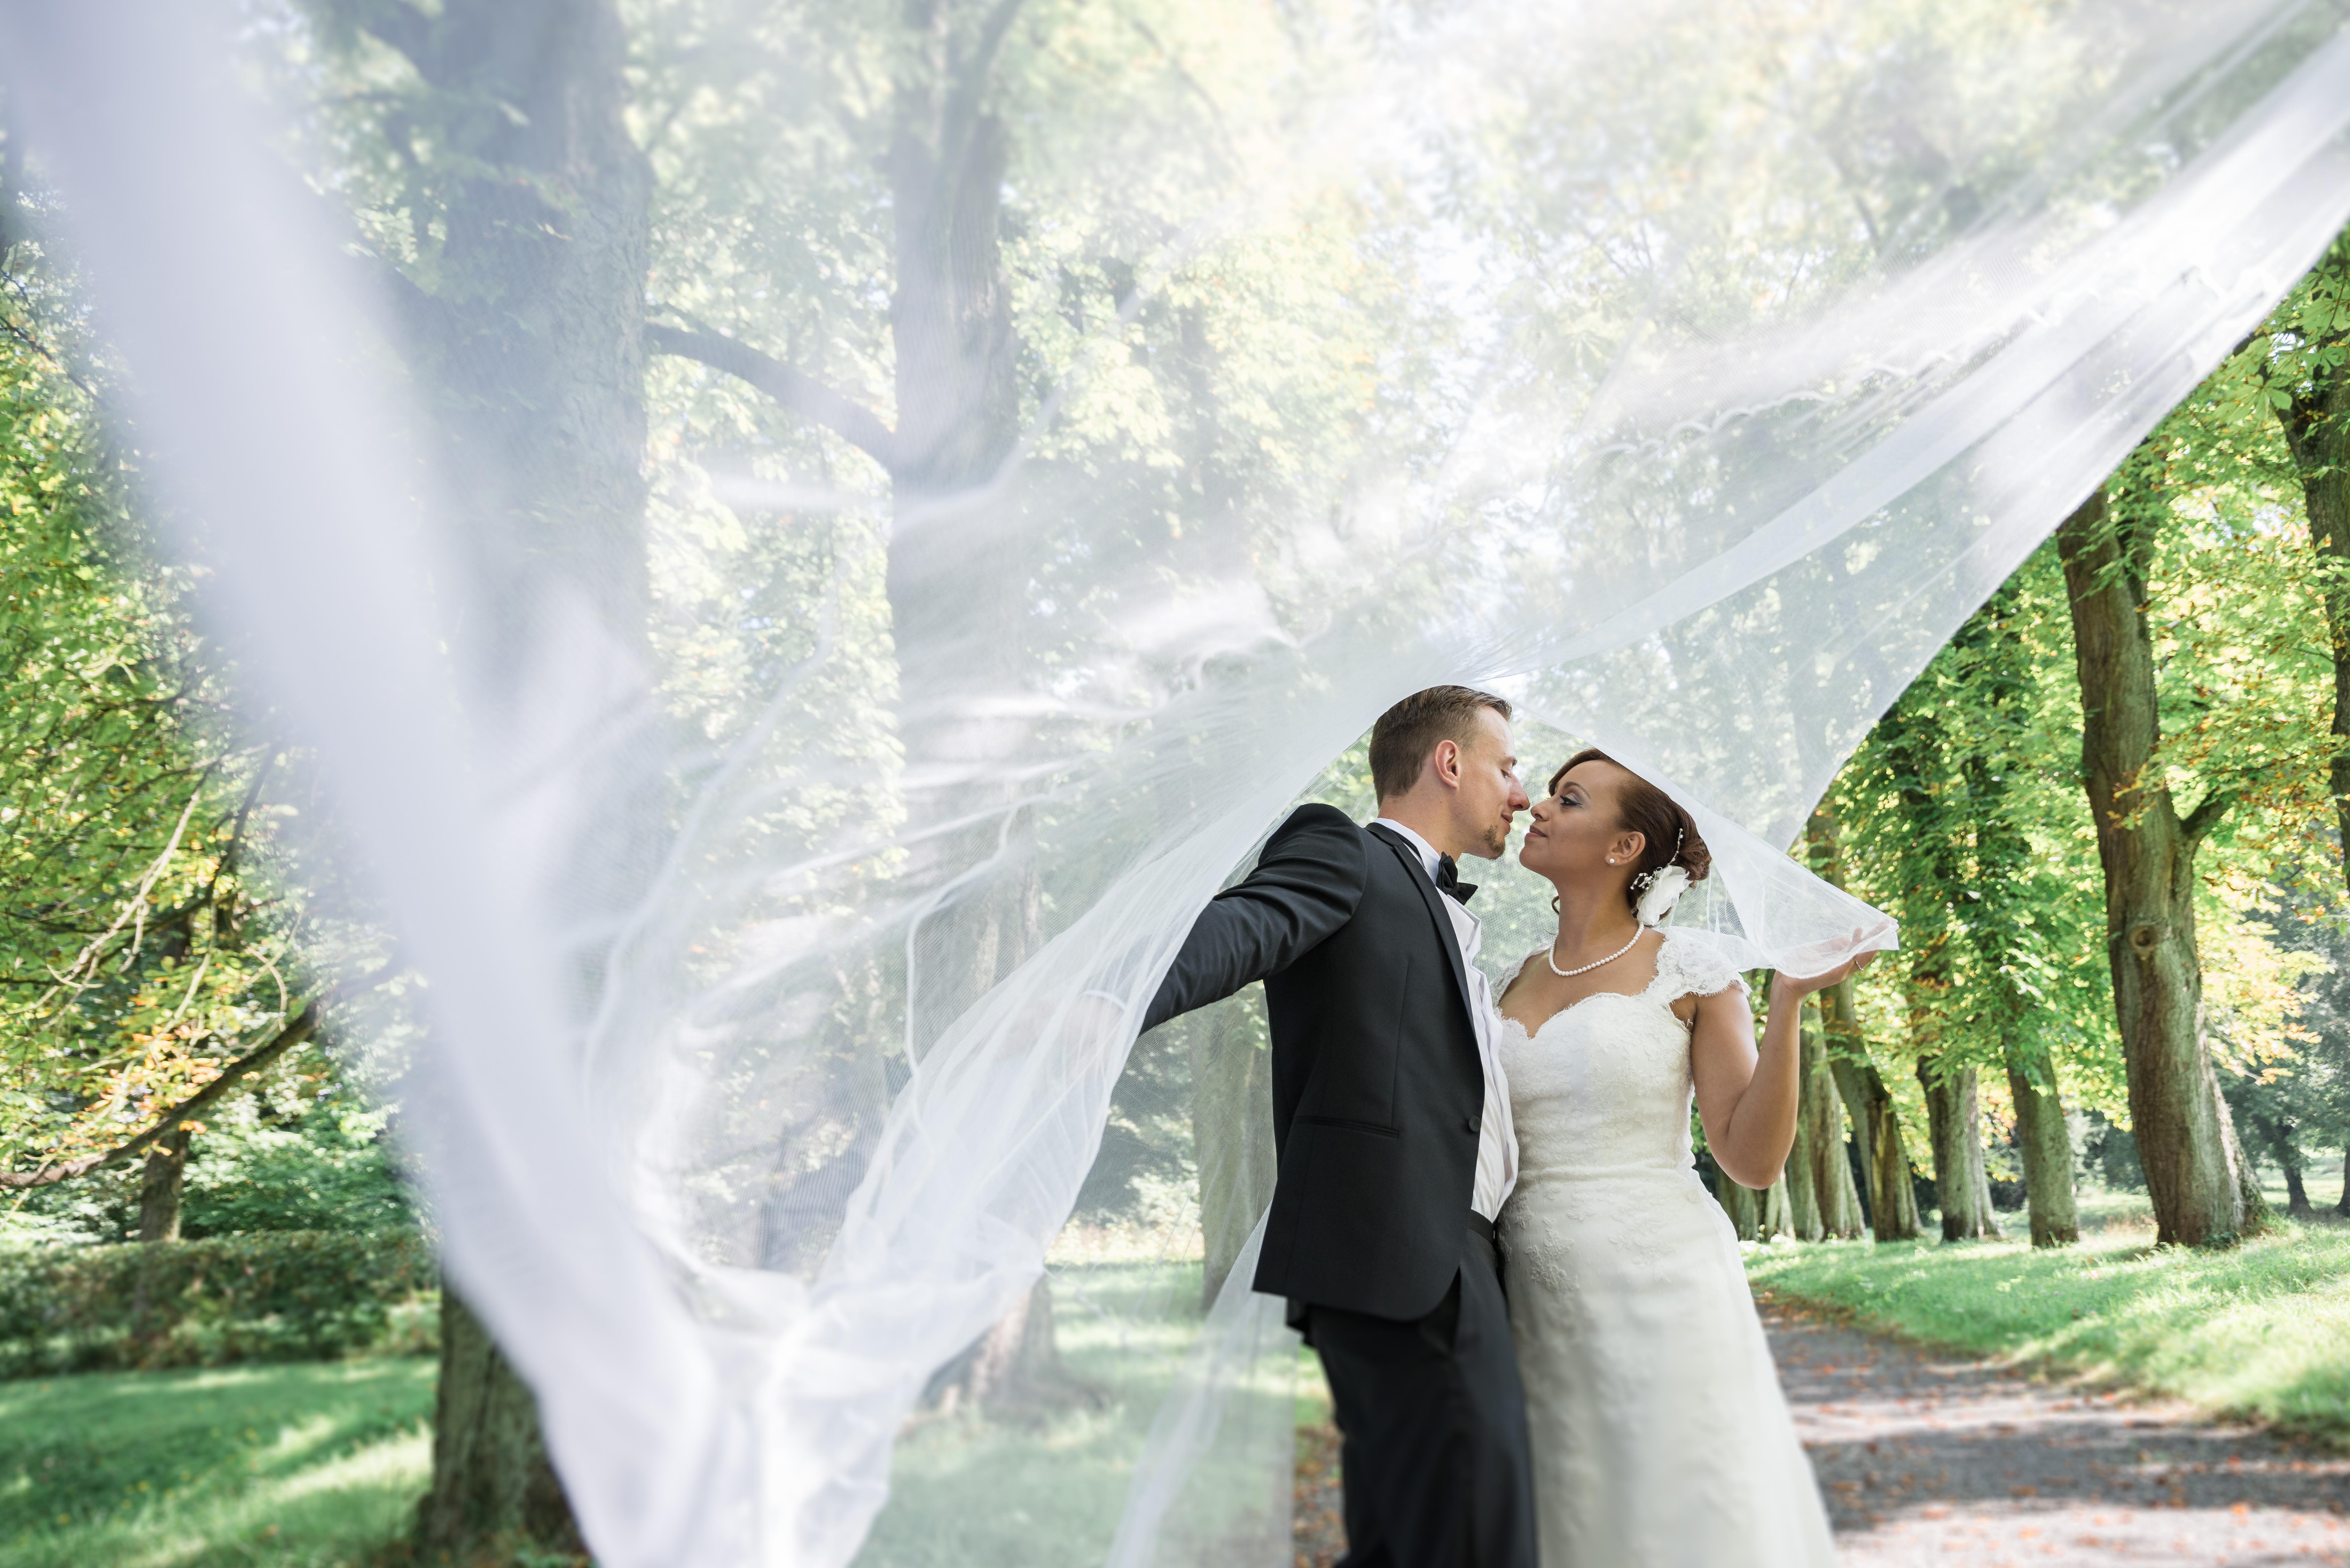 Hochzeitsfotograf in Homberg Ohm, Ma